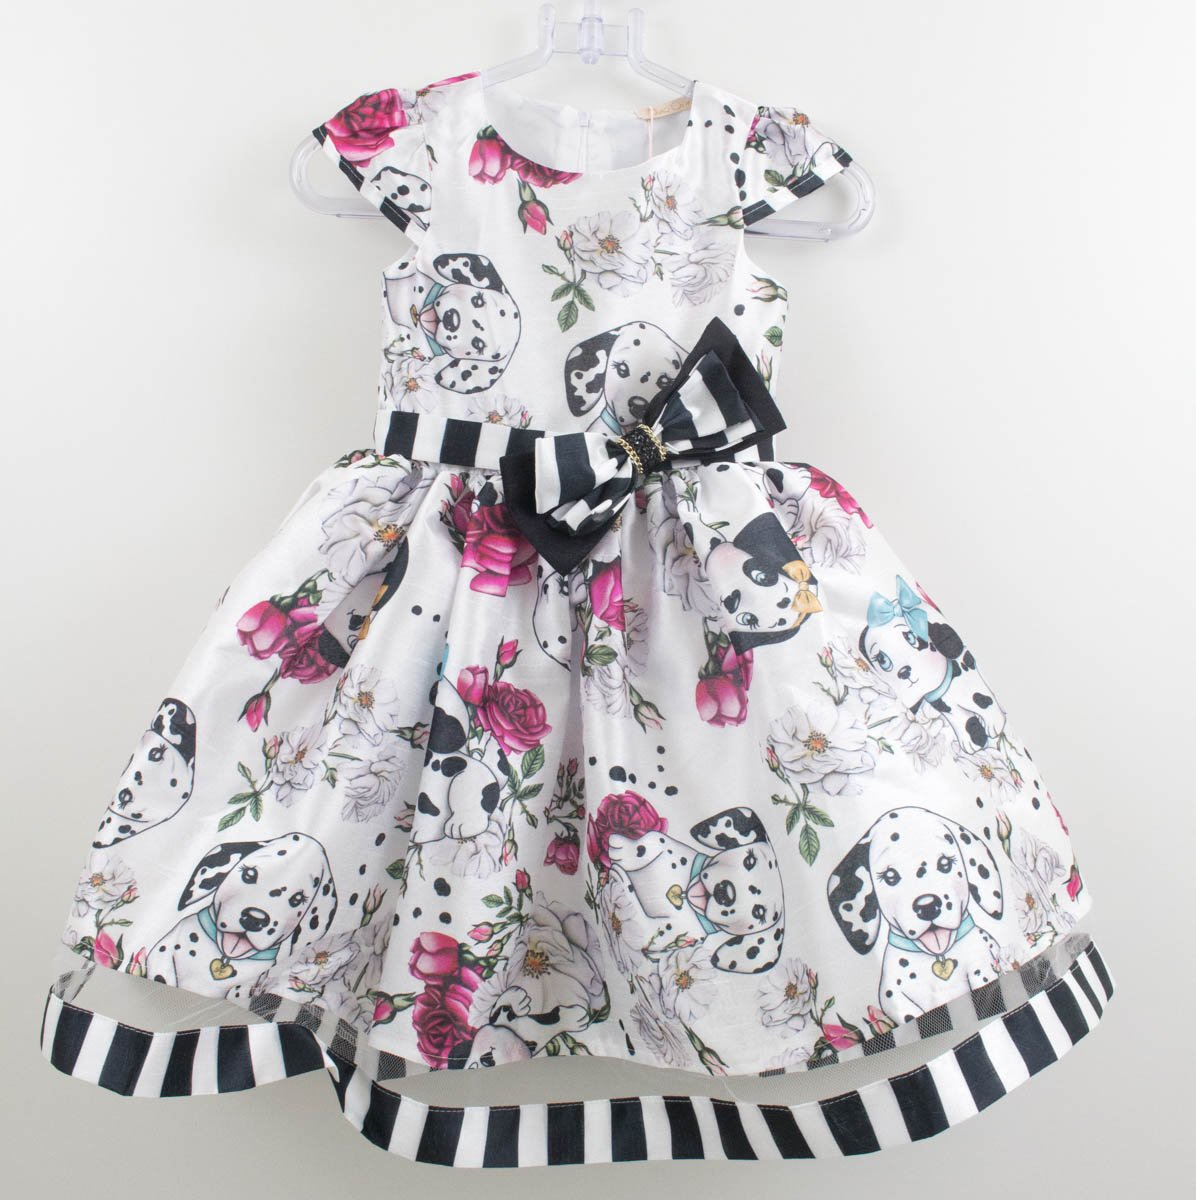 7aefbb8ad Vestido Festa Petit Cherie Estampa Dalmatas - Xuá Kids